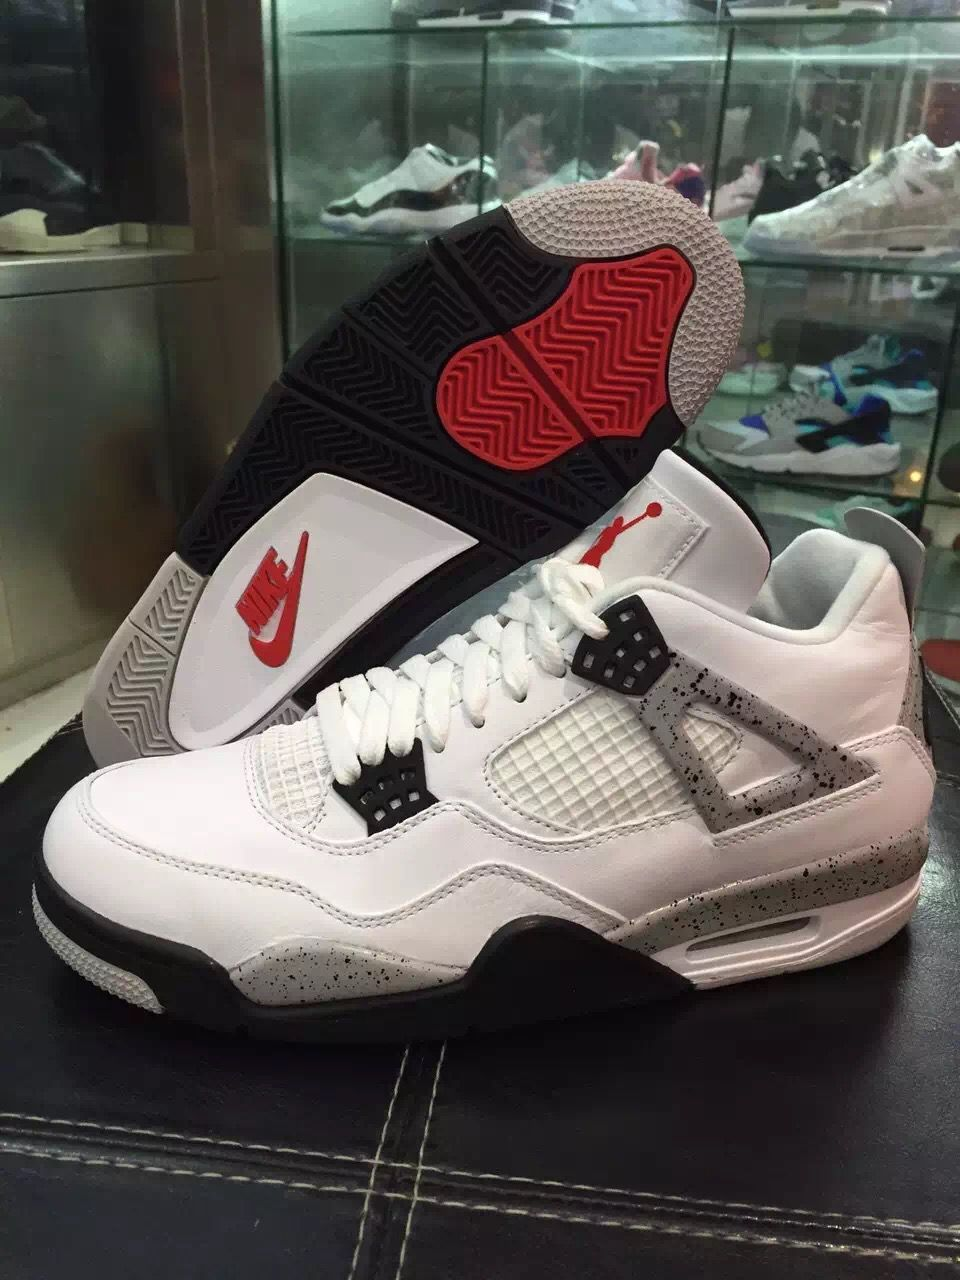 balsa petróleo Llamarada  Nike Air Jordan 4 OG 89 White Cement 2016 - Sneaker Bar Detroit | Air  jordans, Jordans, Nike air jordan